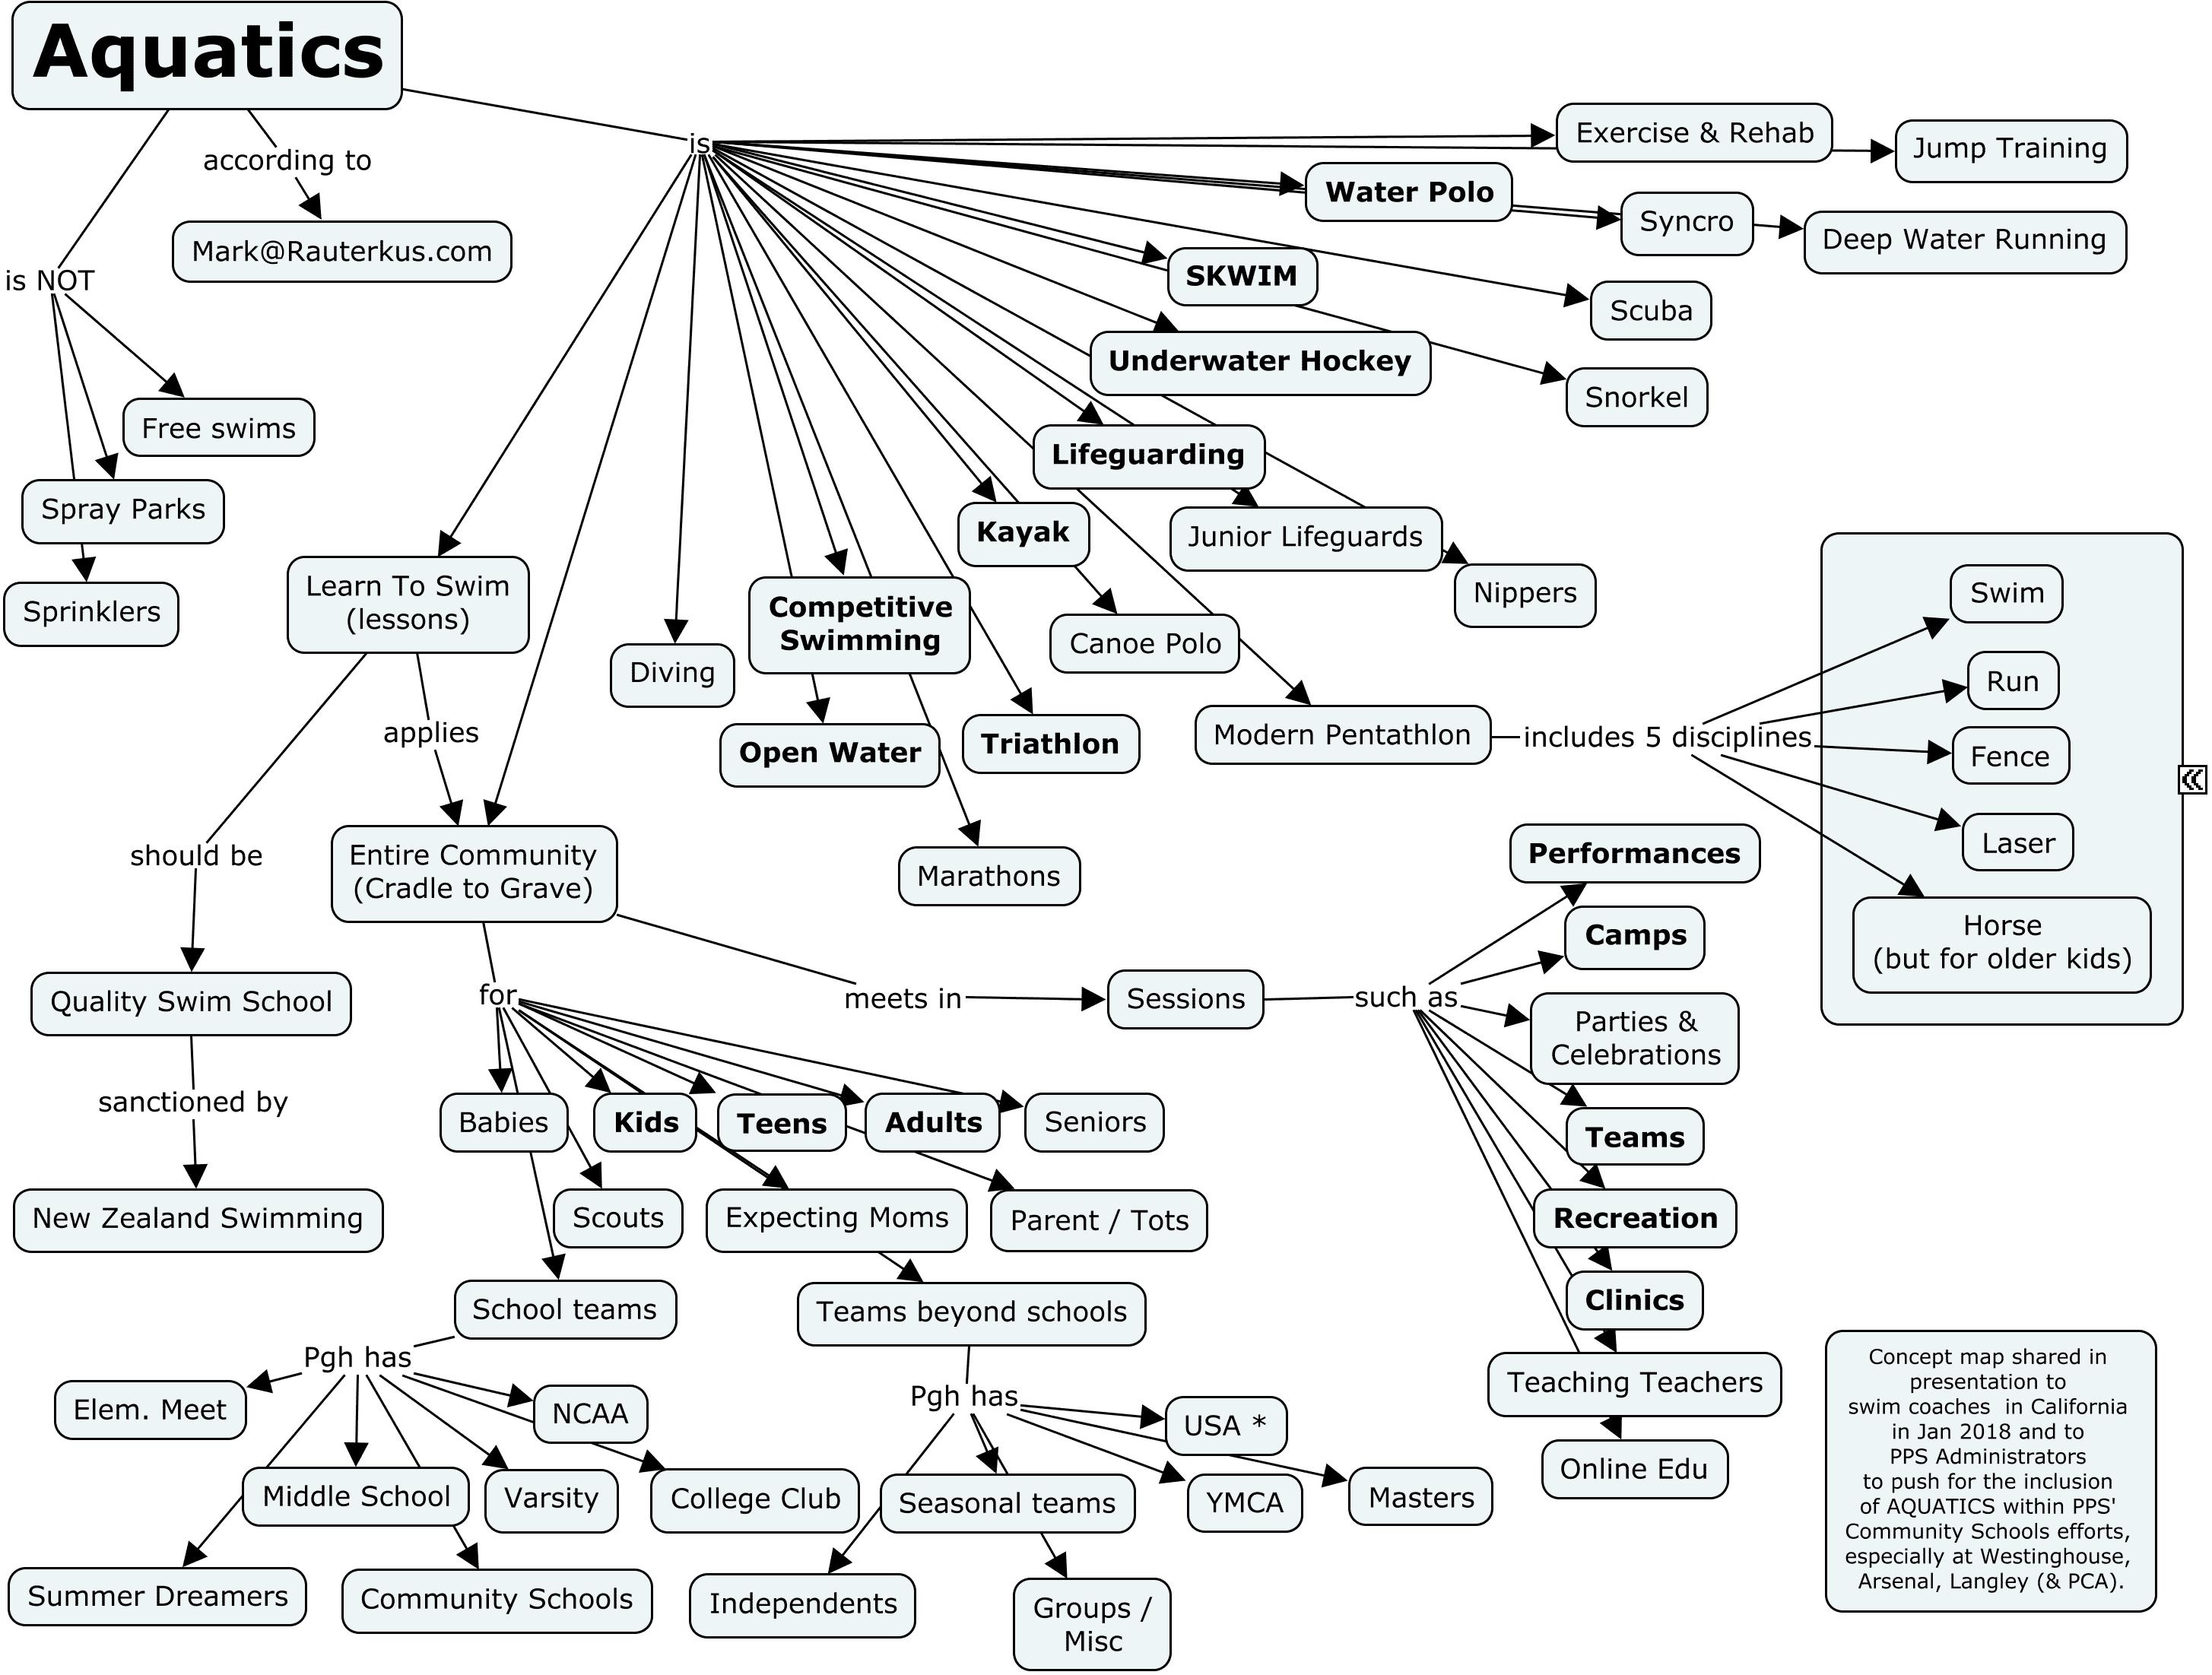 Aquatics concept map by Mark Rauterkus